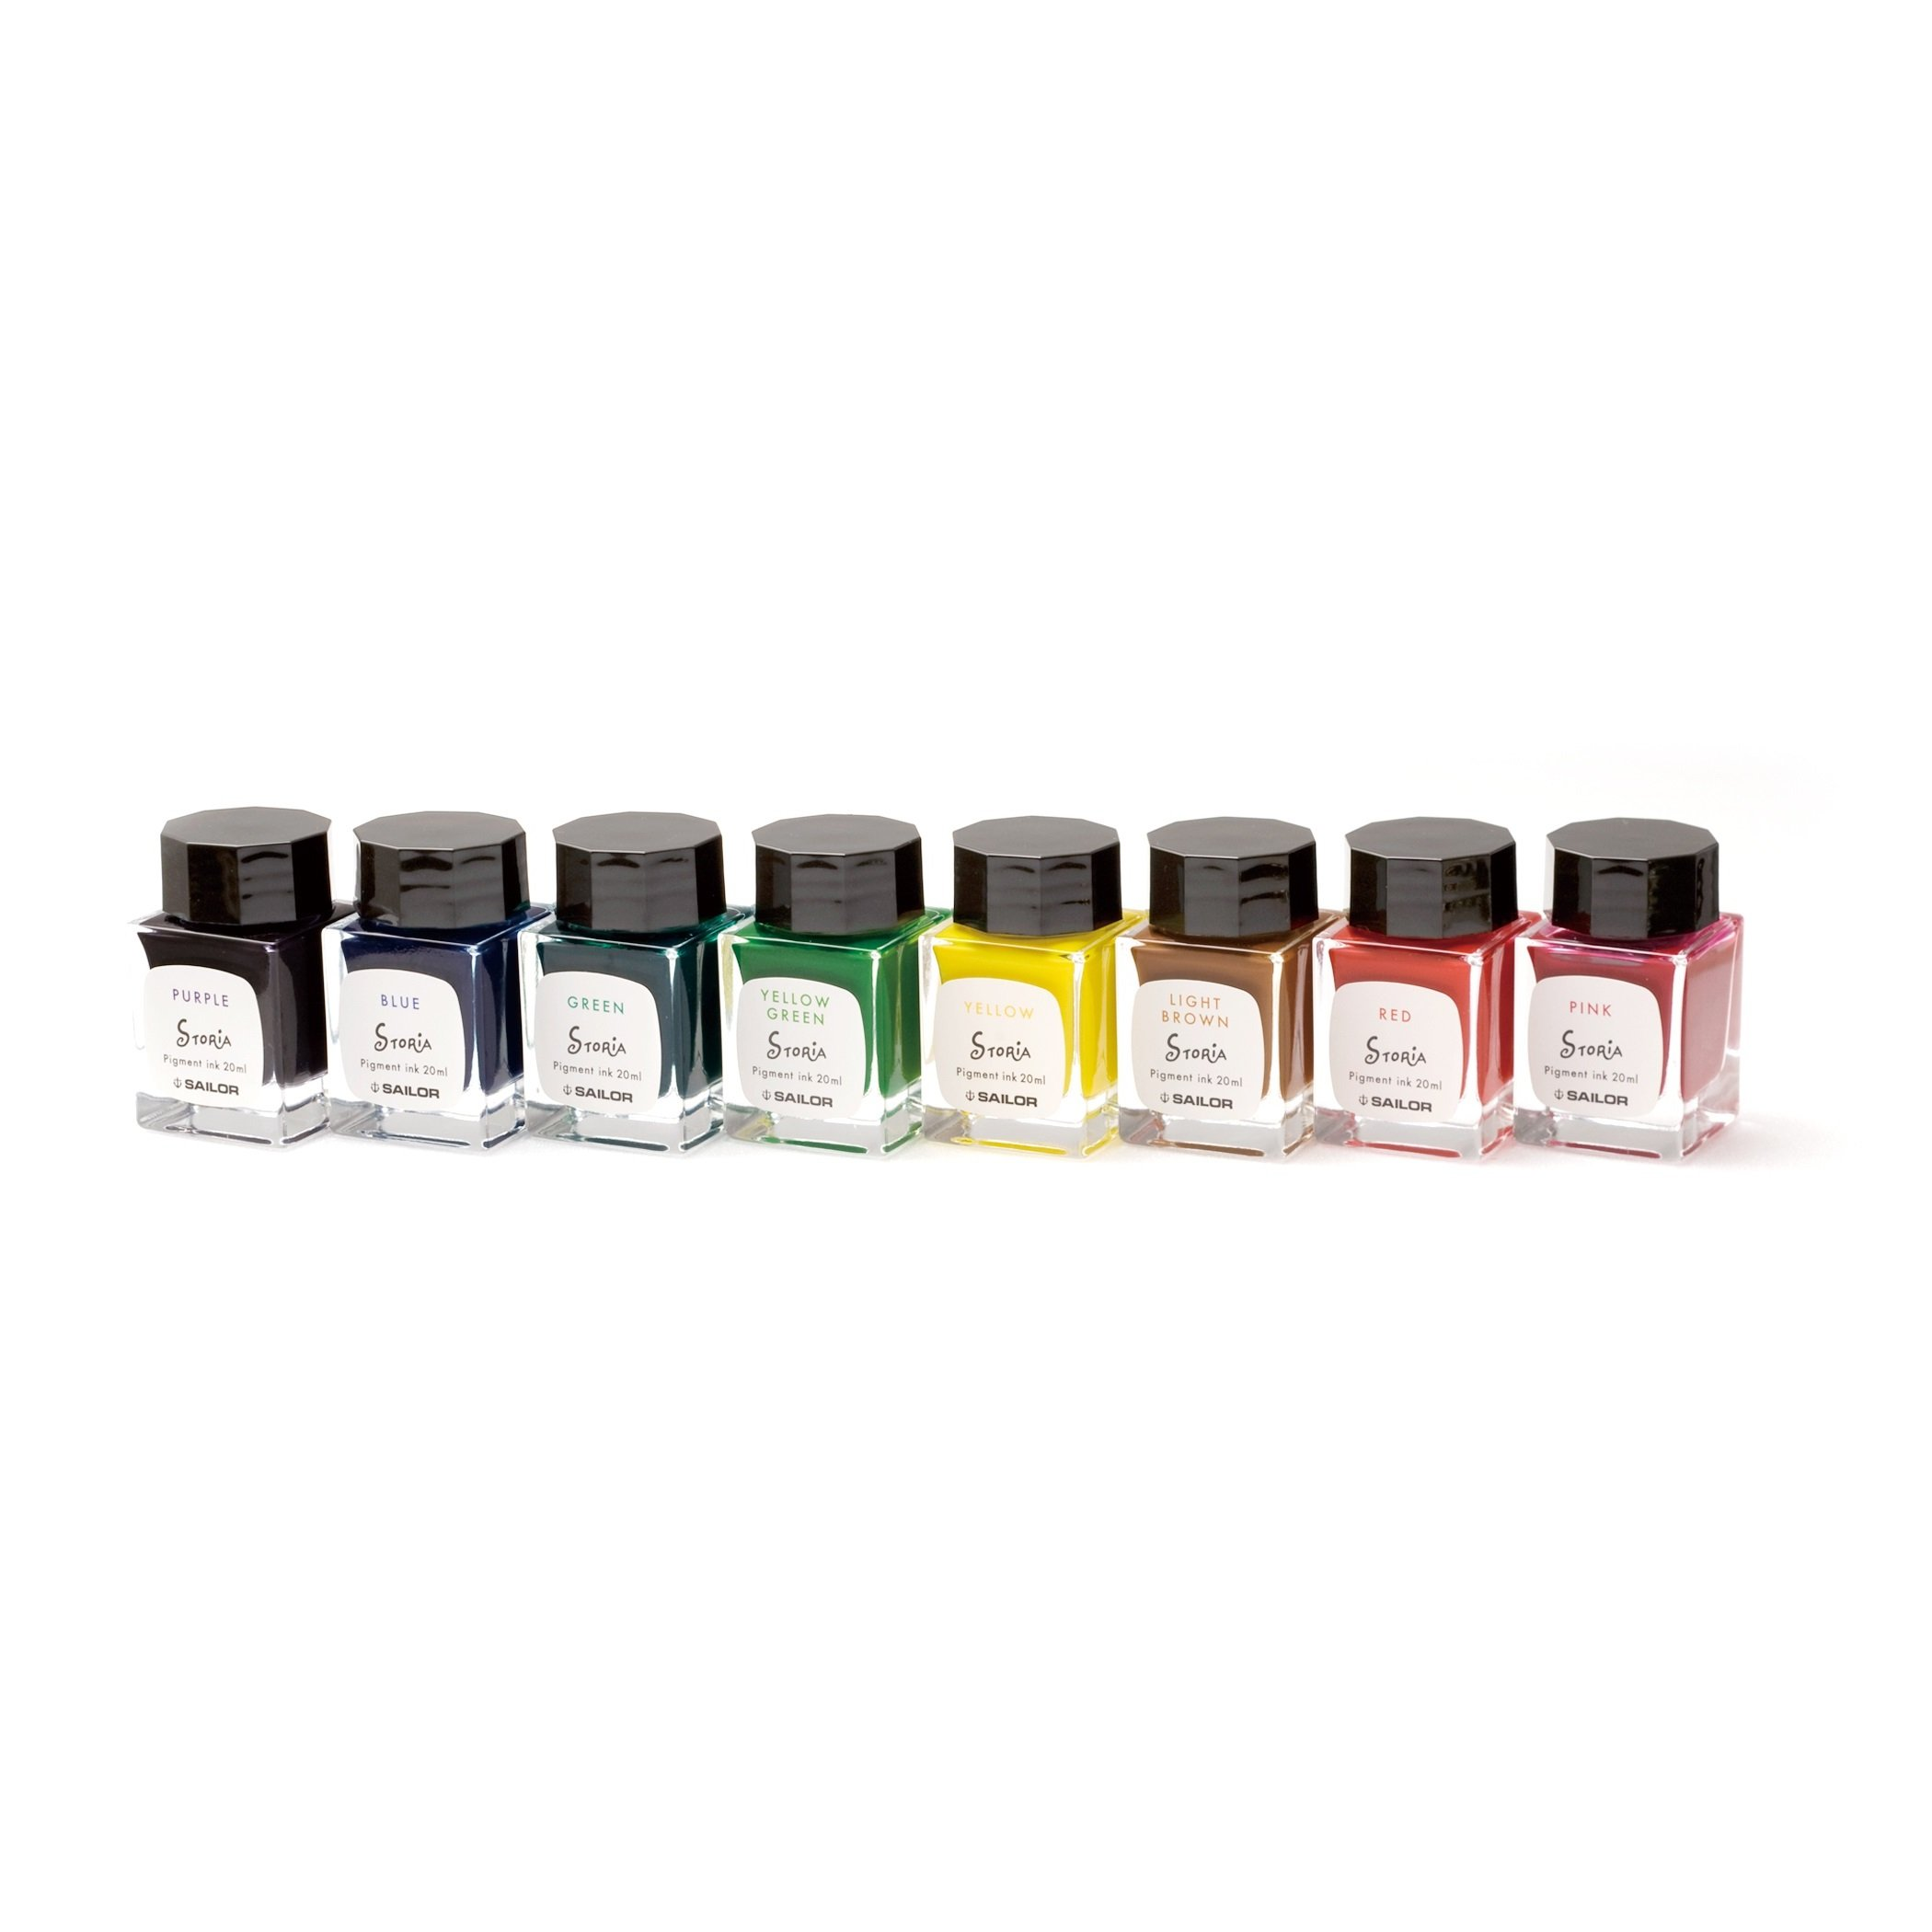 Sailor Fountain Pen mini Bottle 20ml Ink 8 Color Gift Set - Pigment Based '' STORiA '' by Sailor (Image #1)